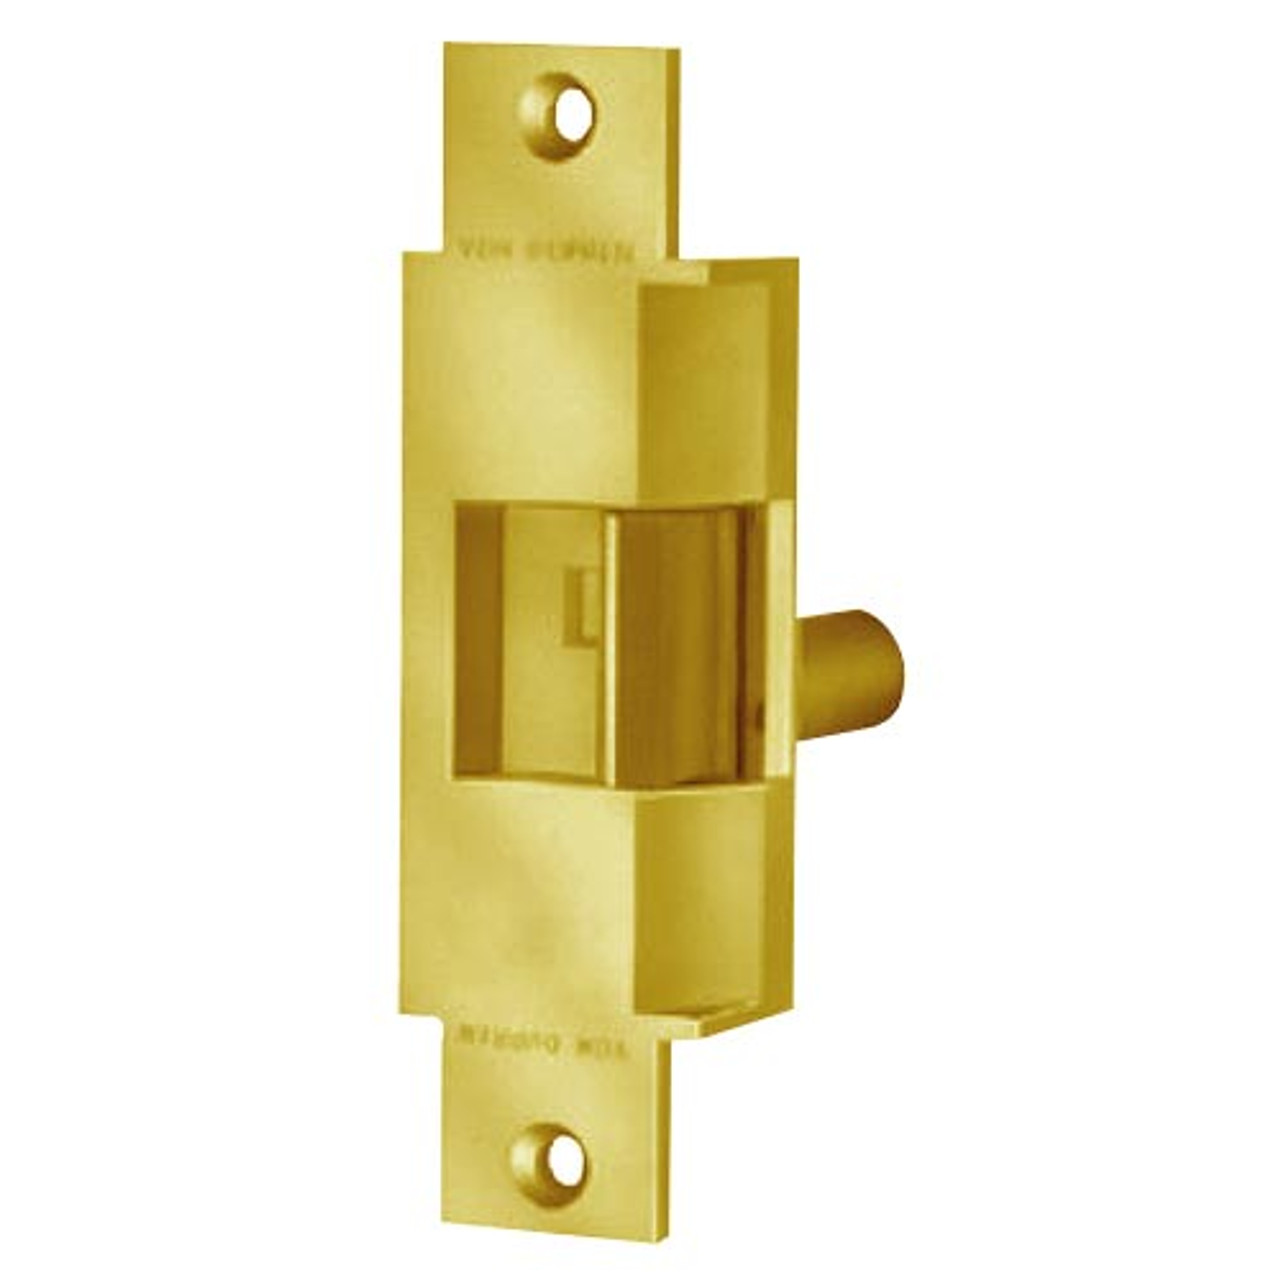 6223-FS-24VDC-US3 Von Duprin Electric Strike in Bright Brass Finish